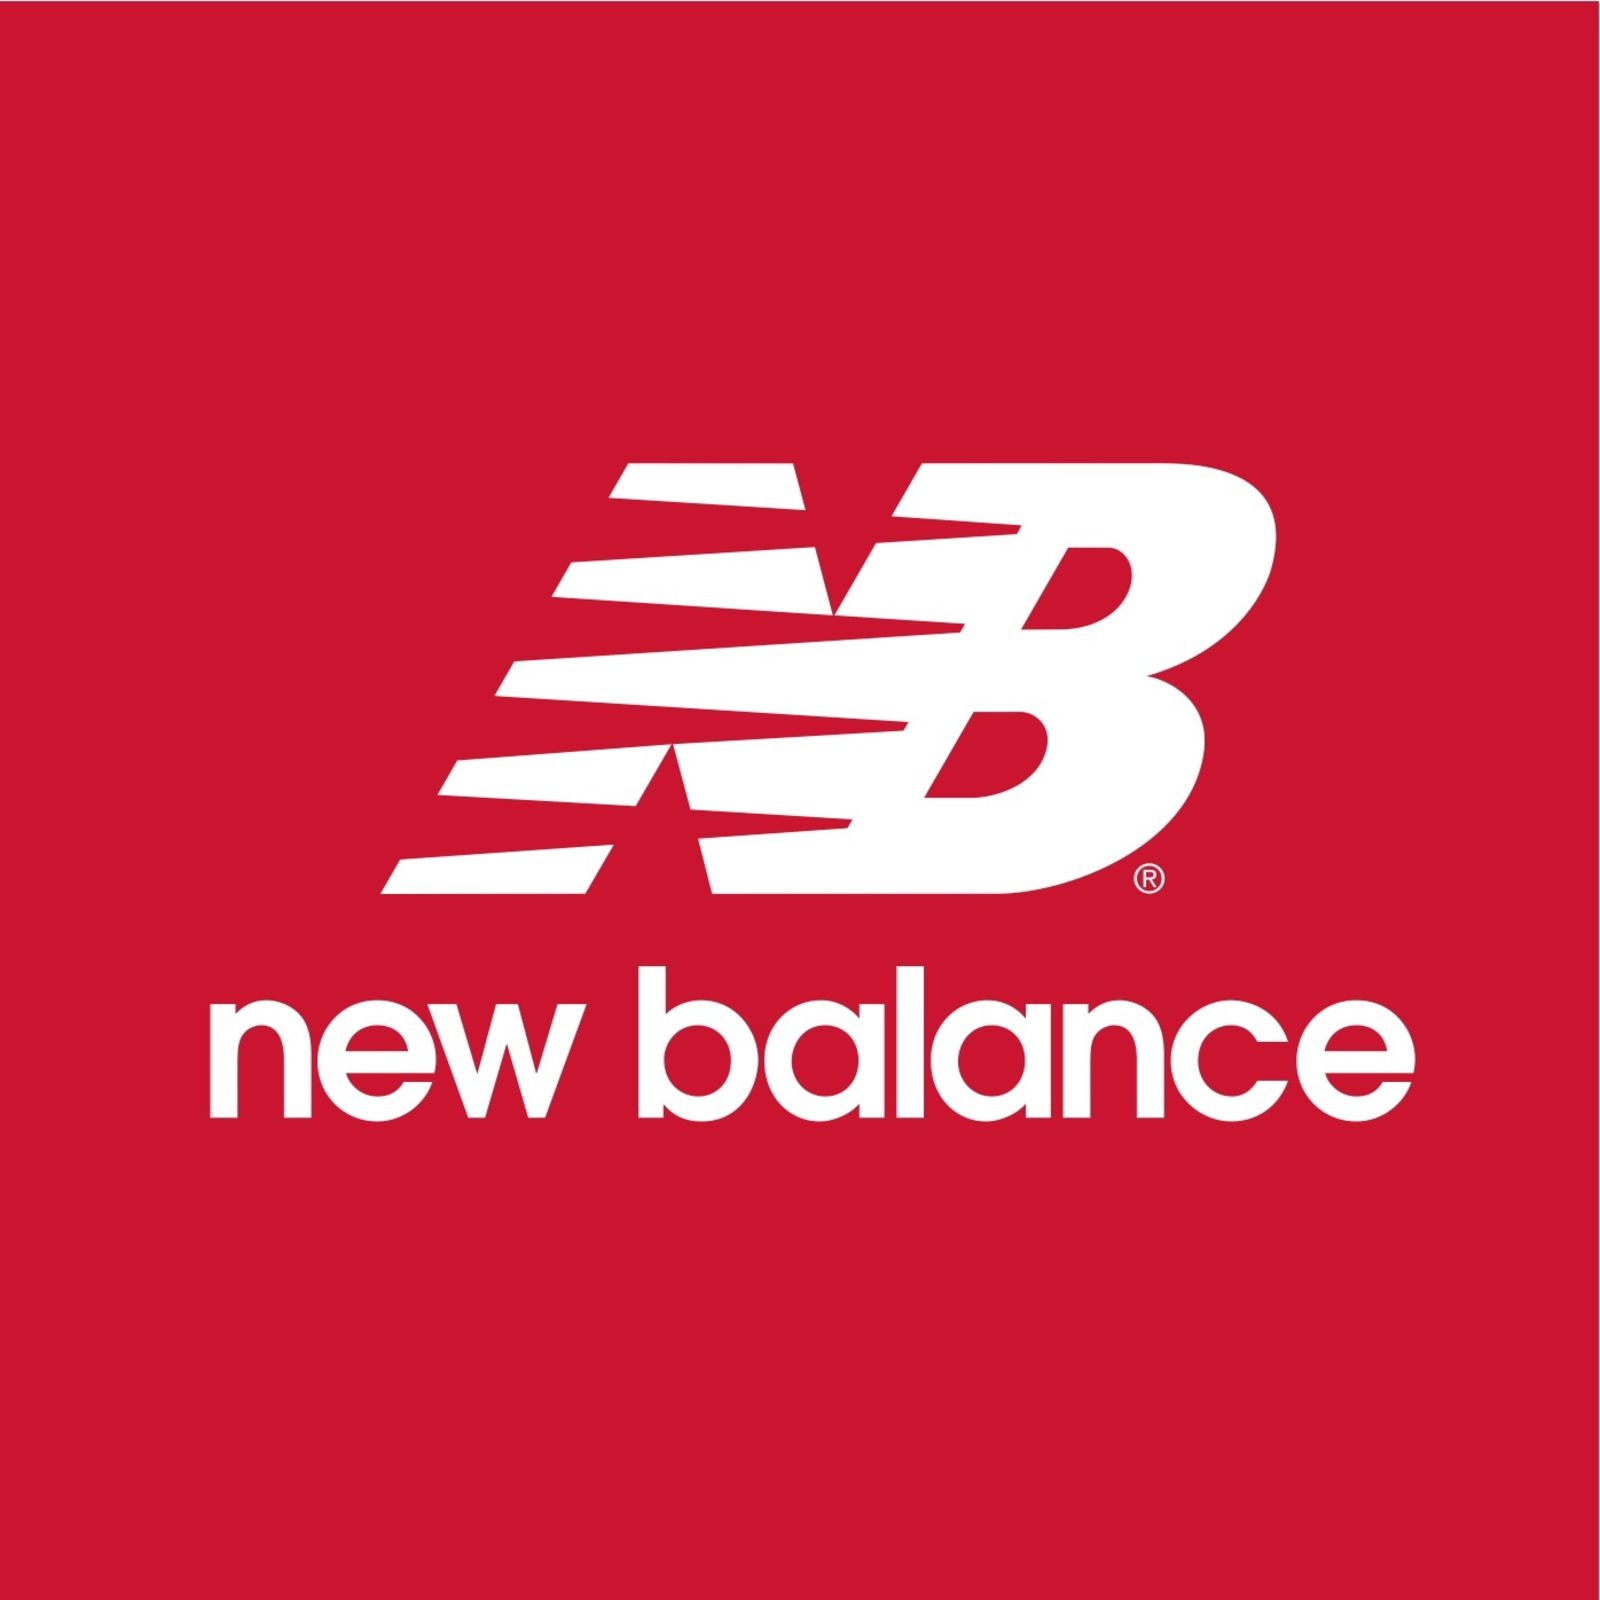 New Balance (Image 1)